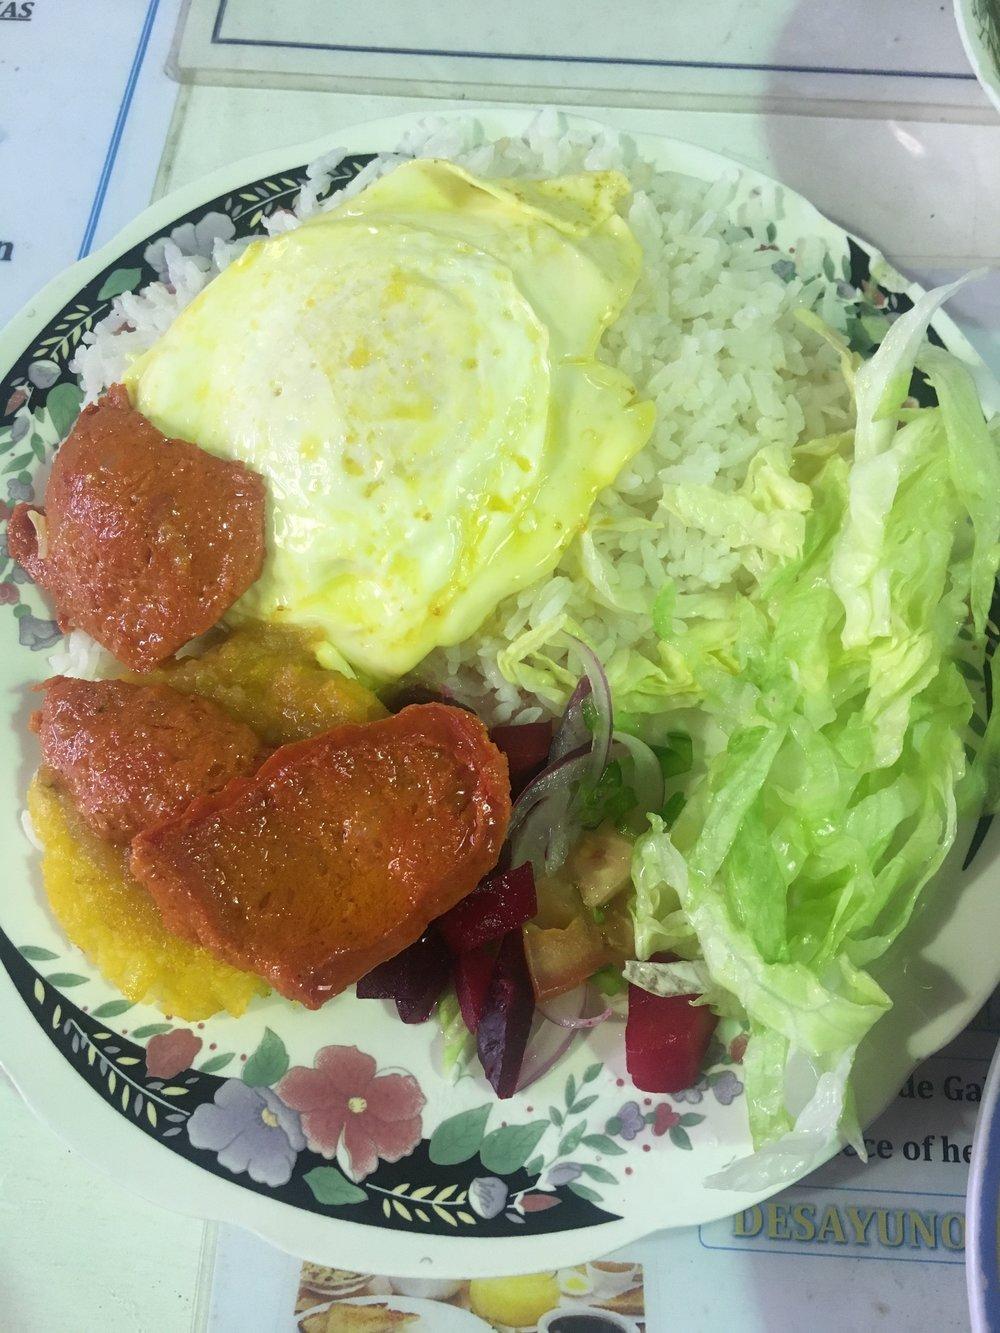 My lunch of Llapingachos.